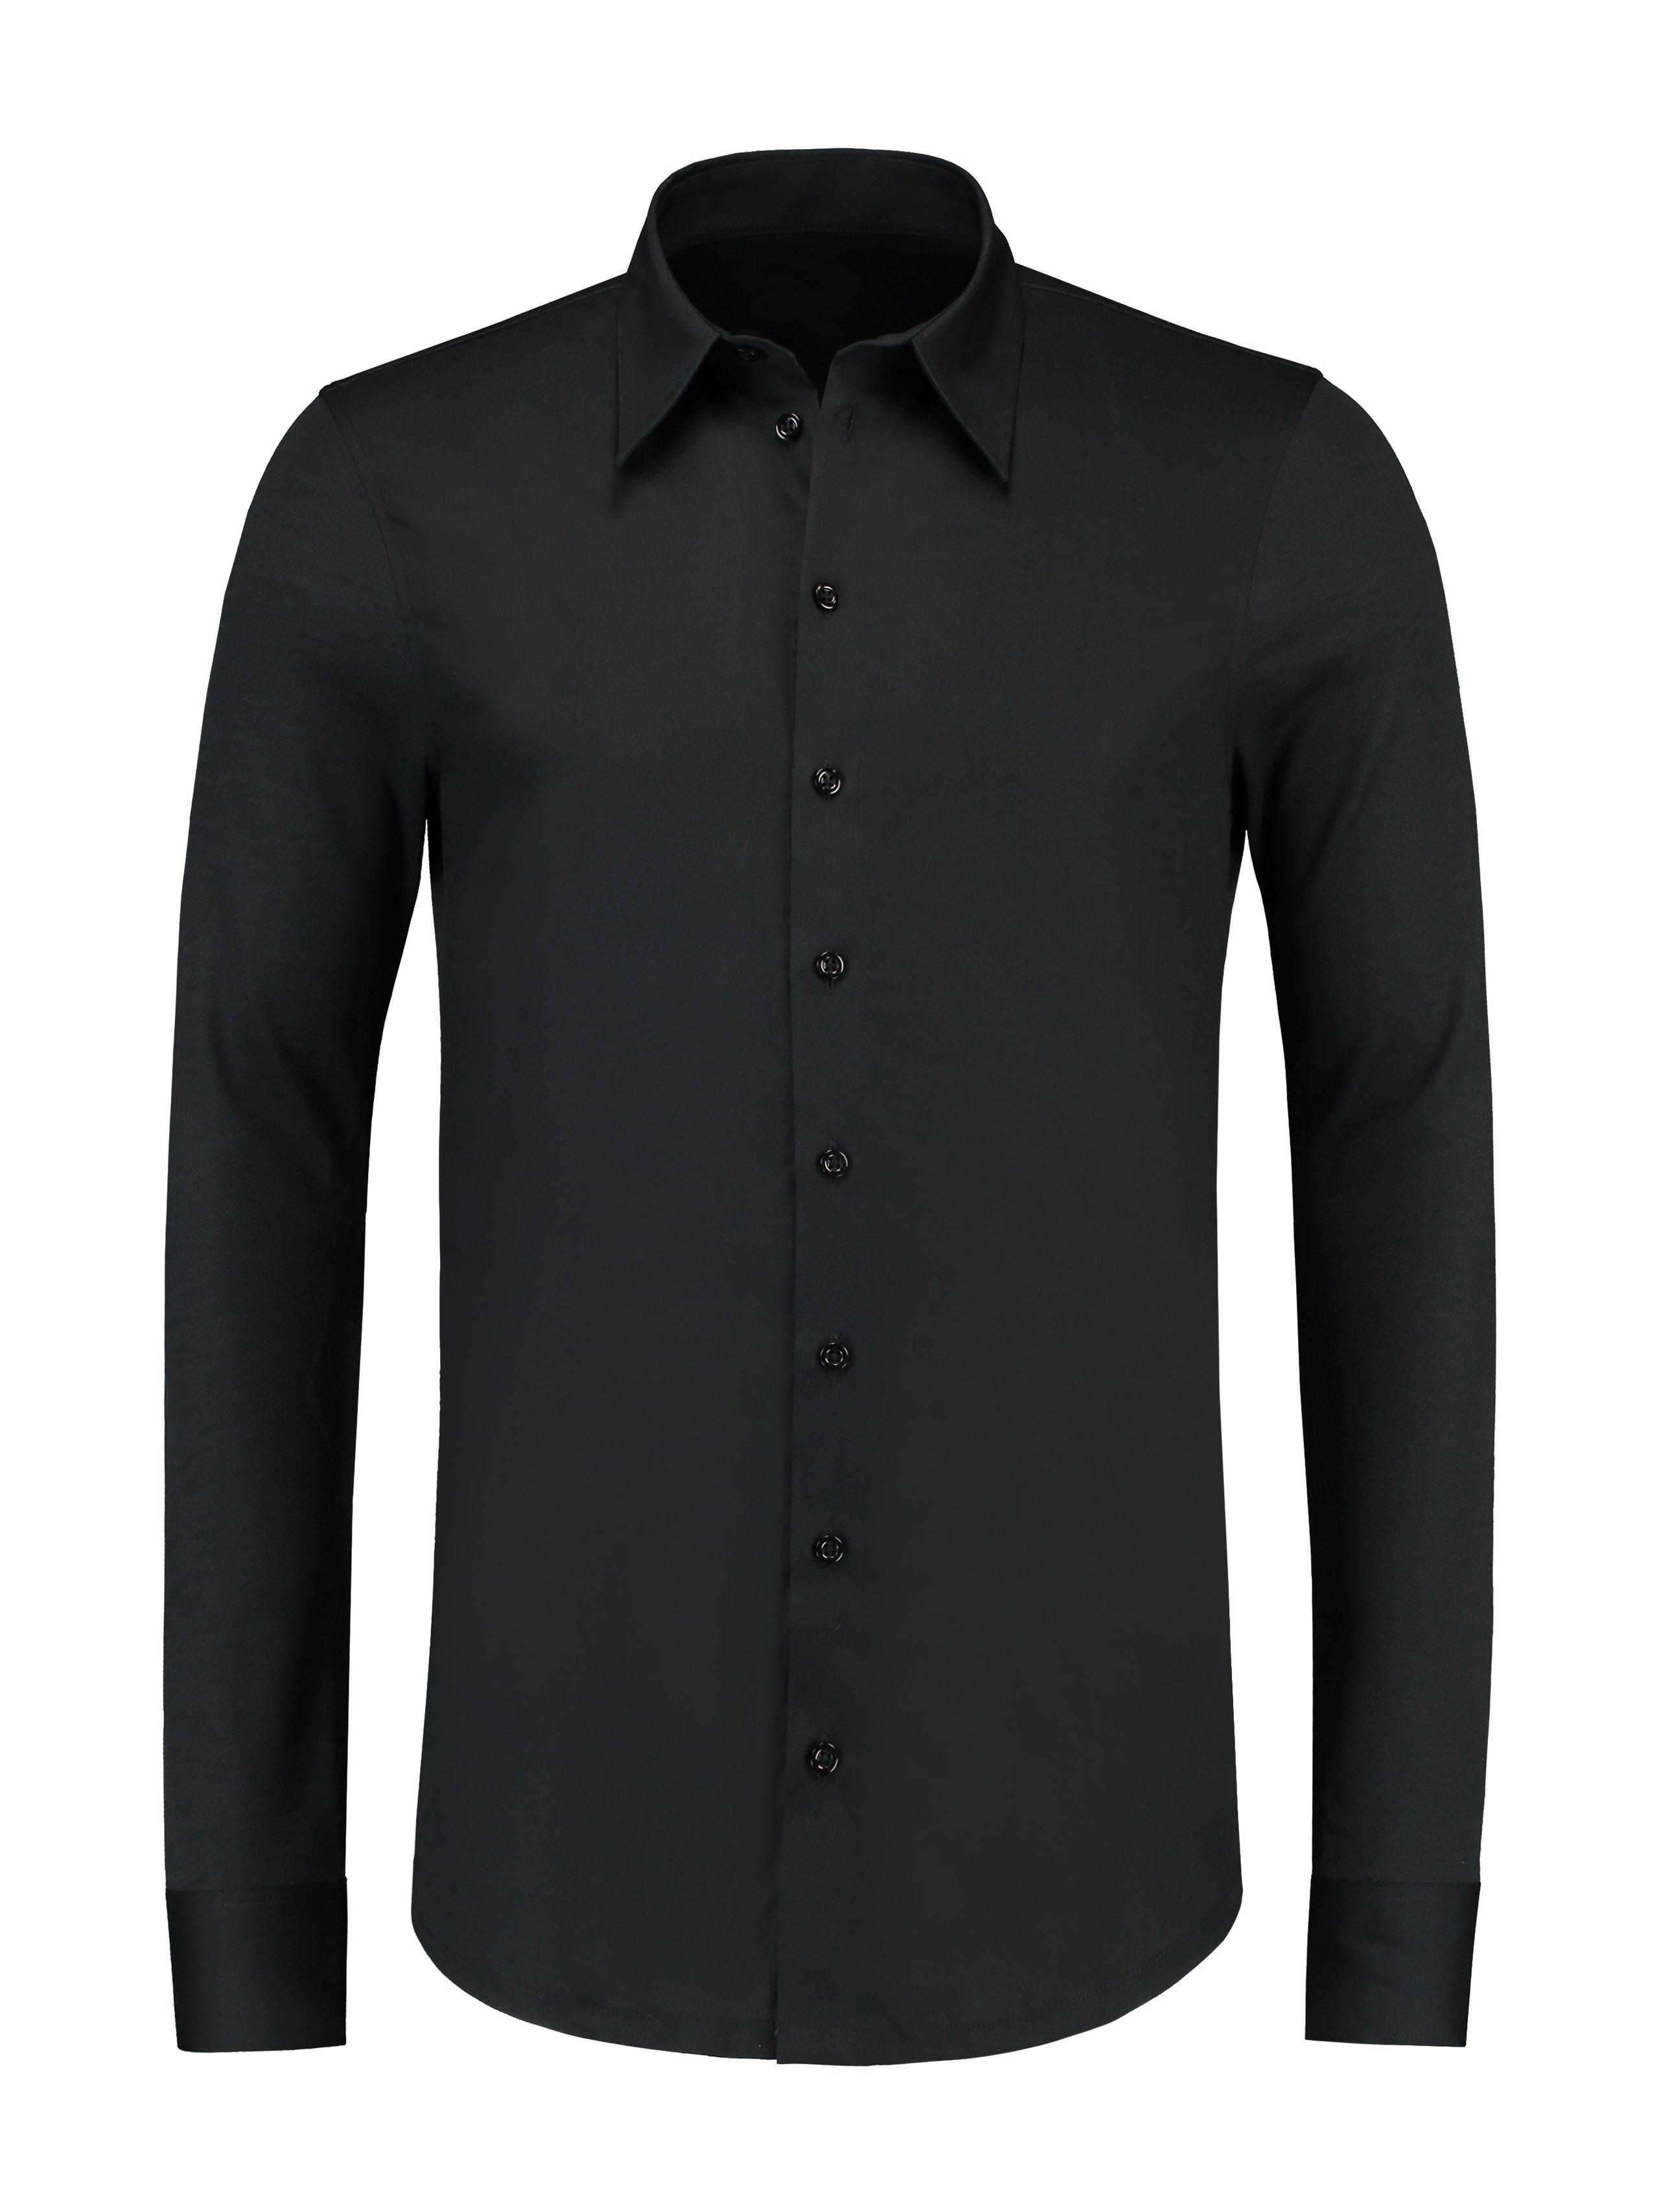 Service Shirt Jesse Black